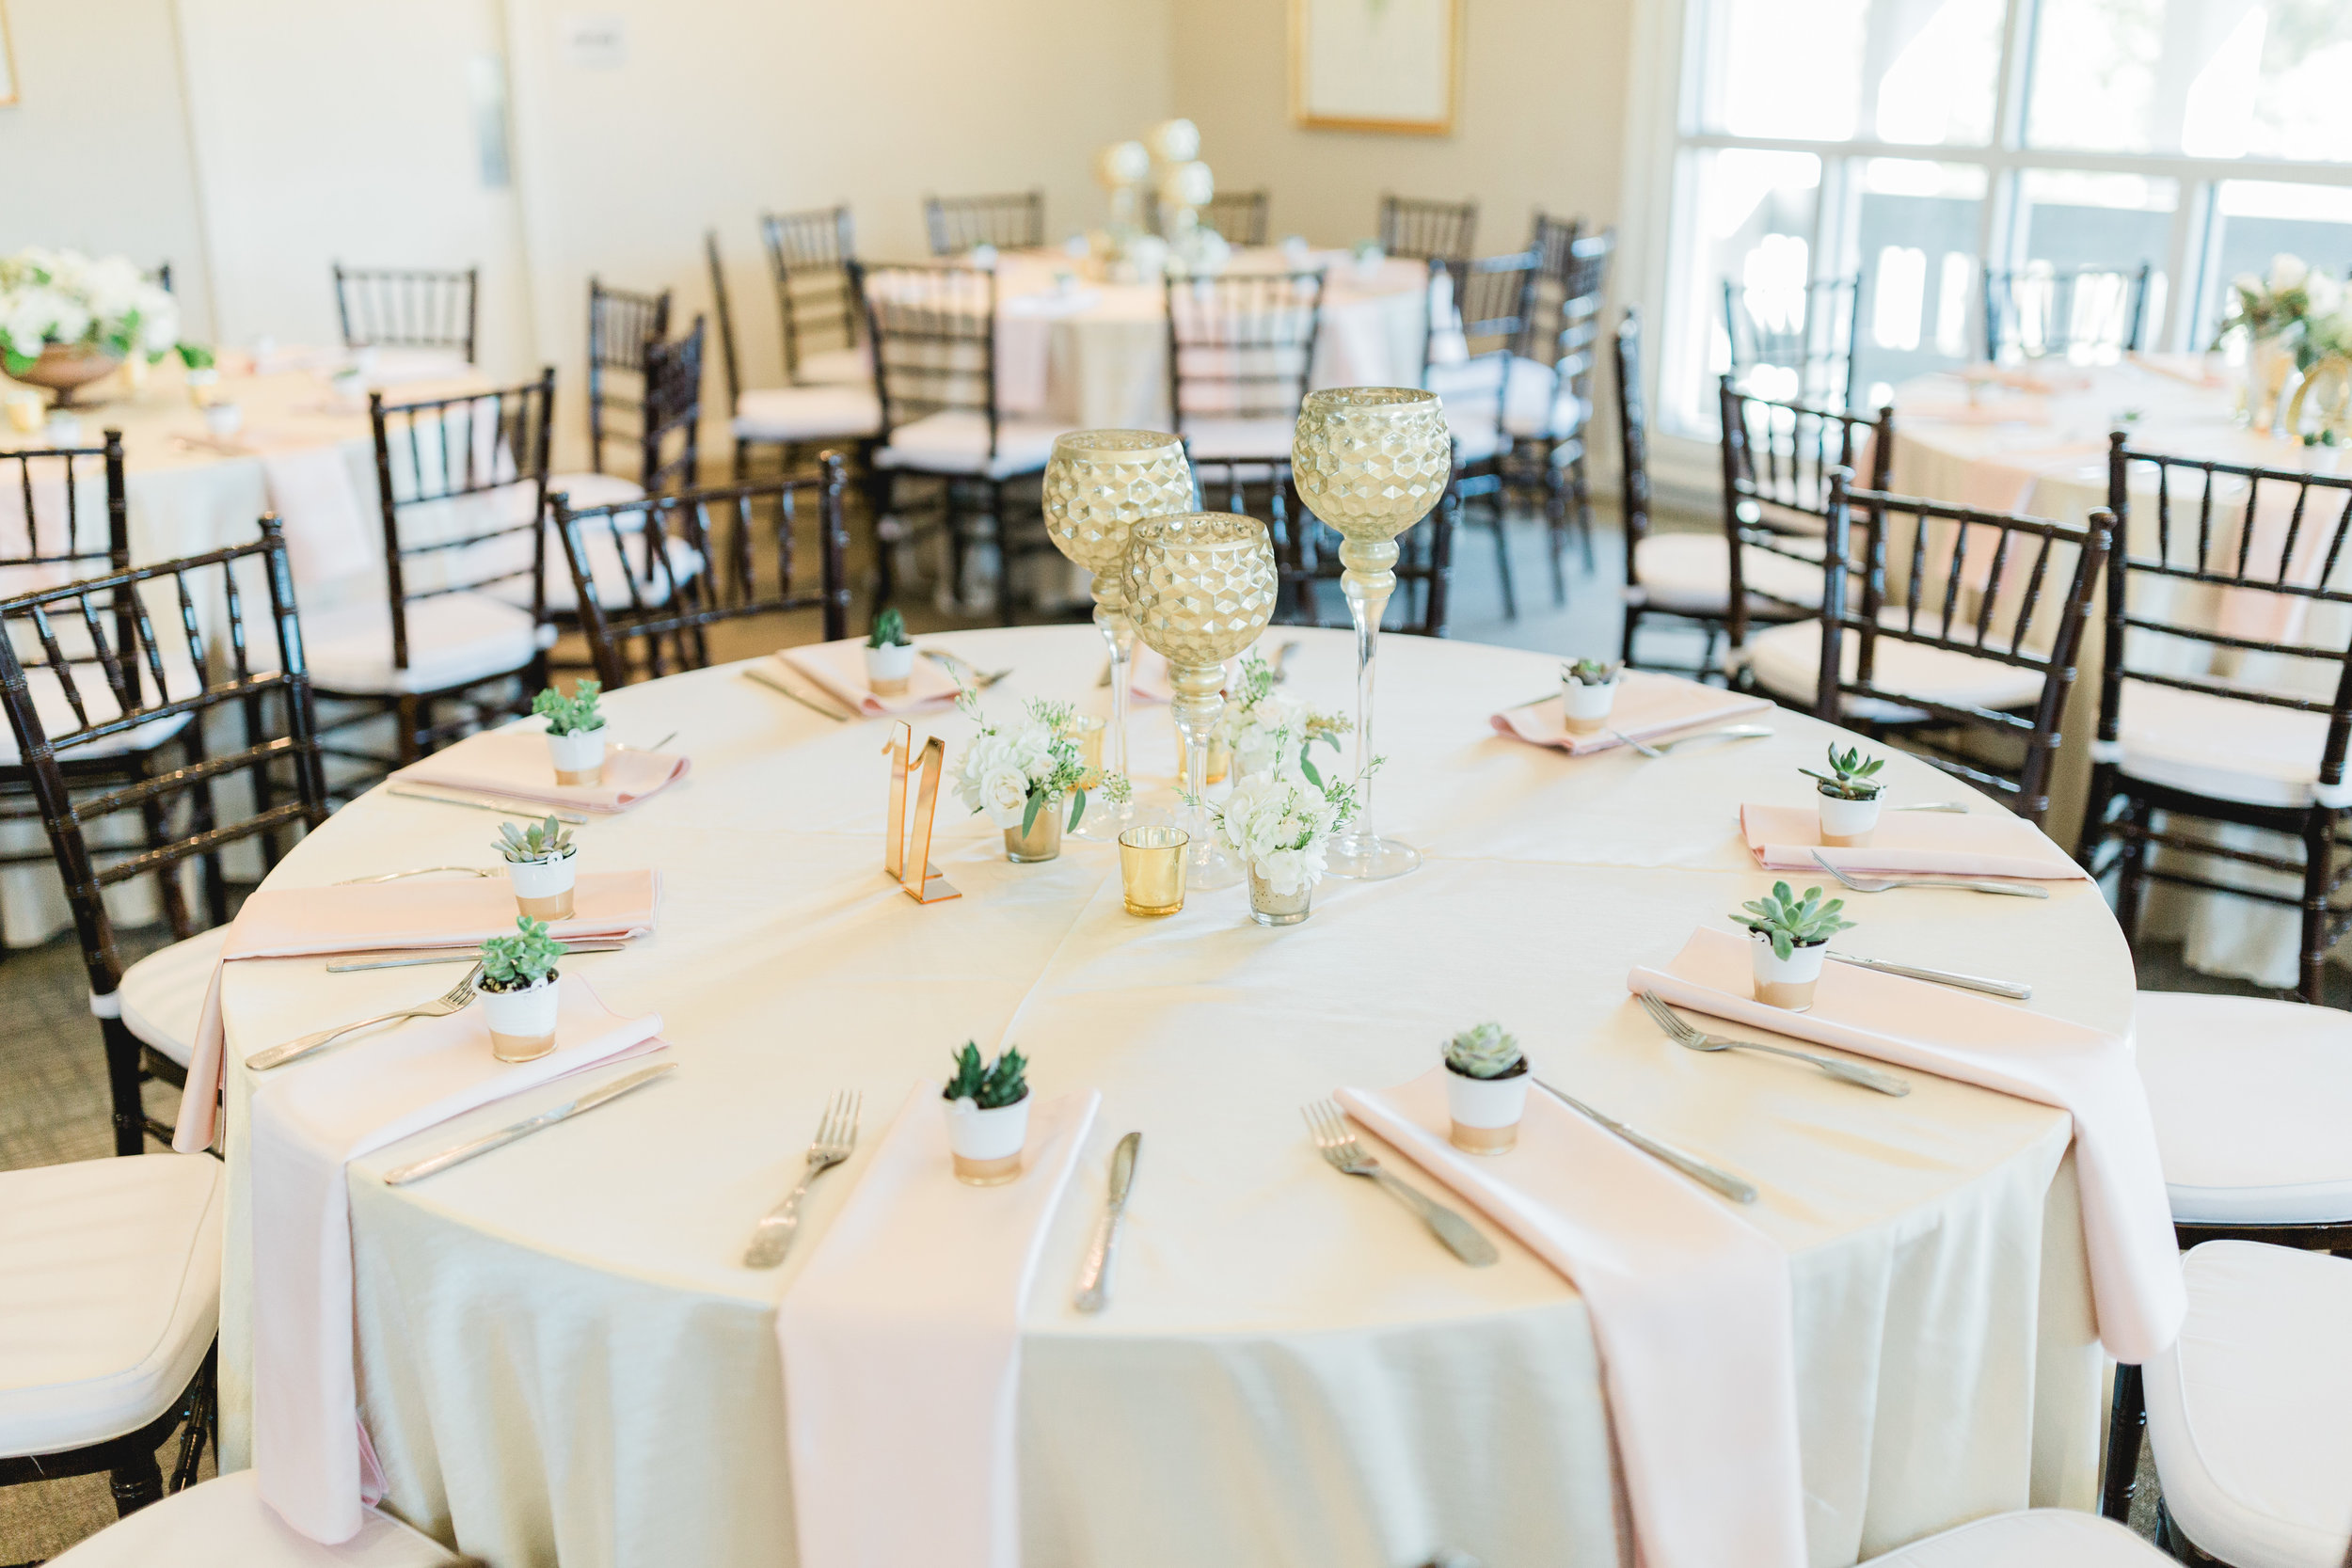 Snee Farm Weddings